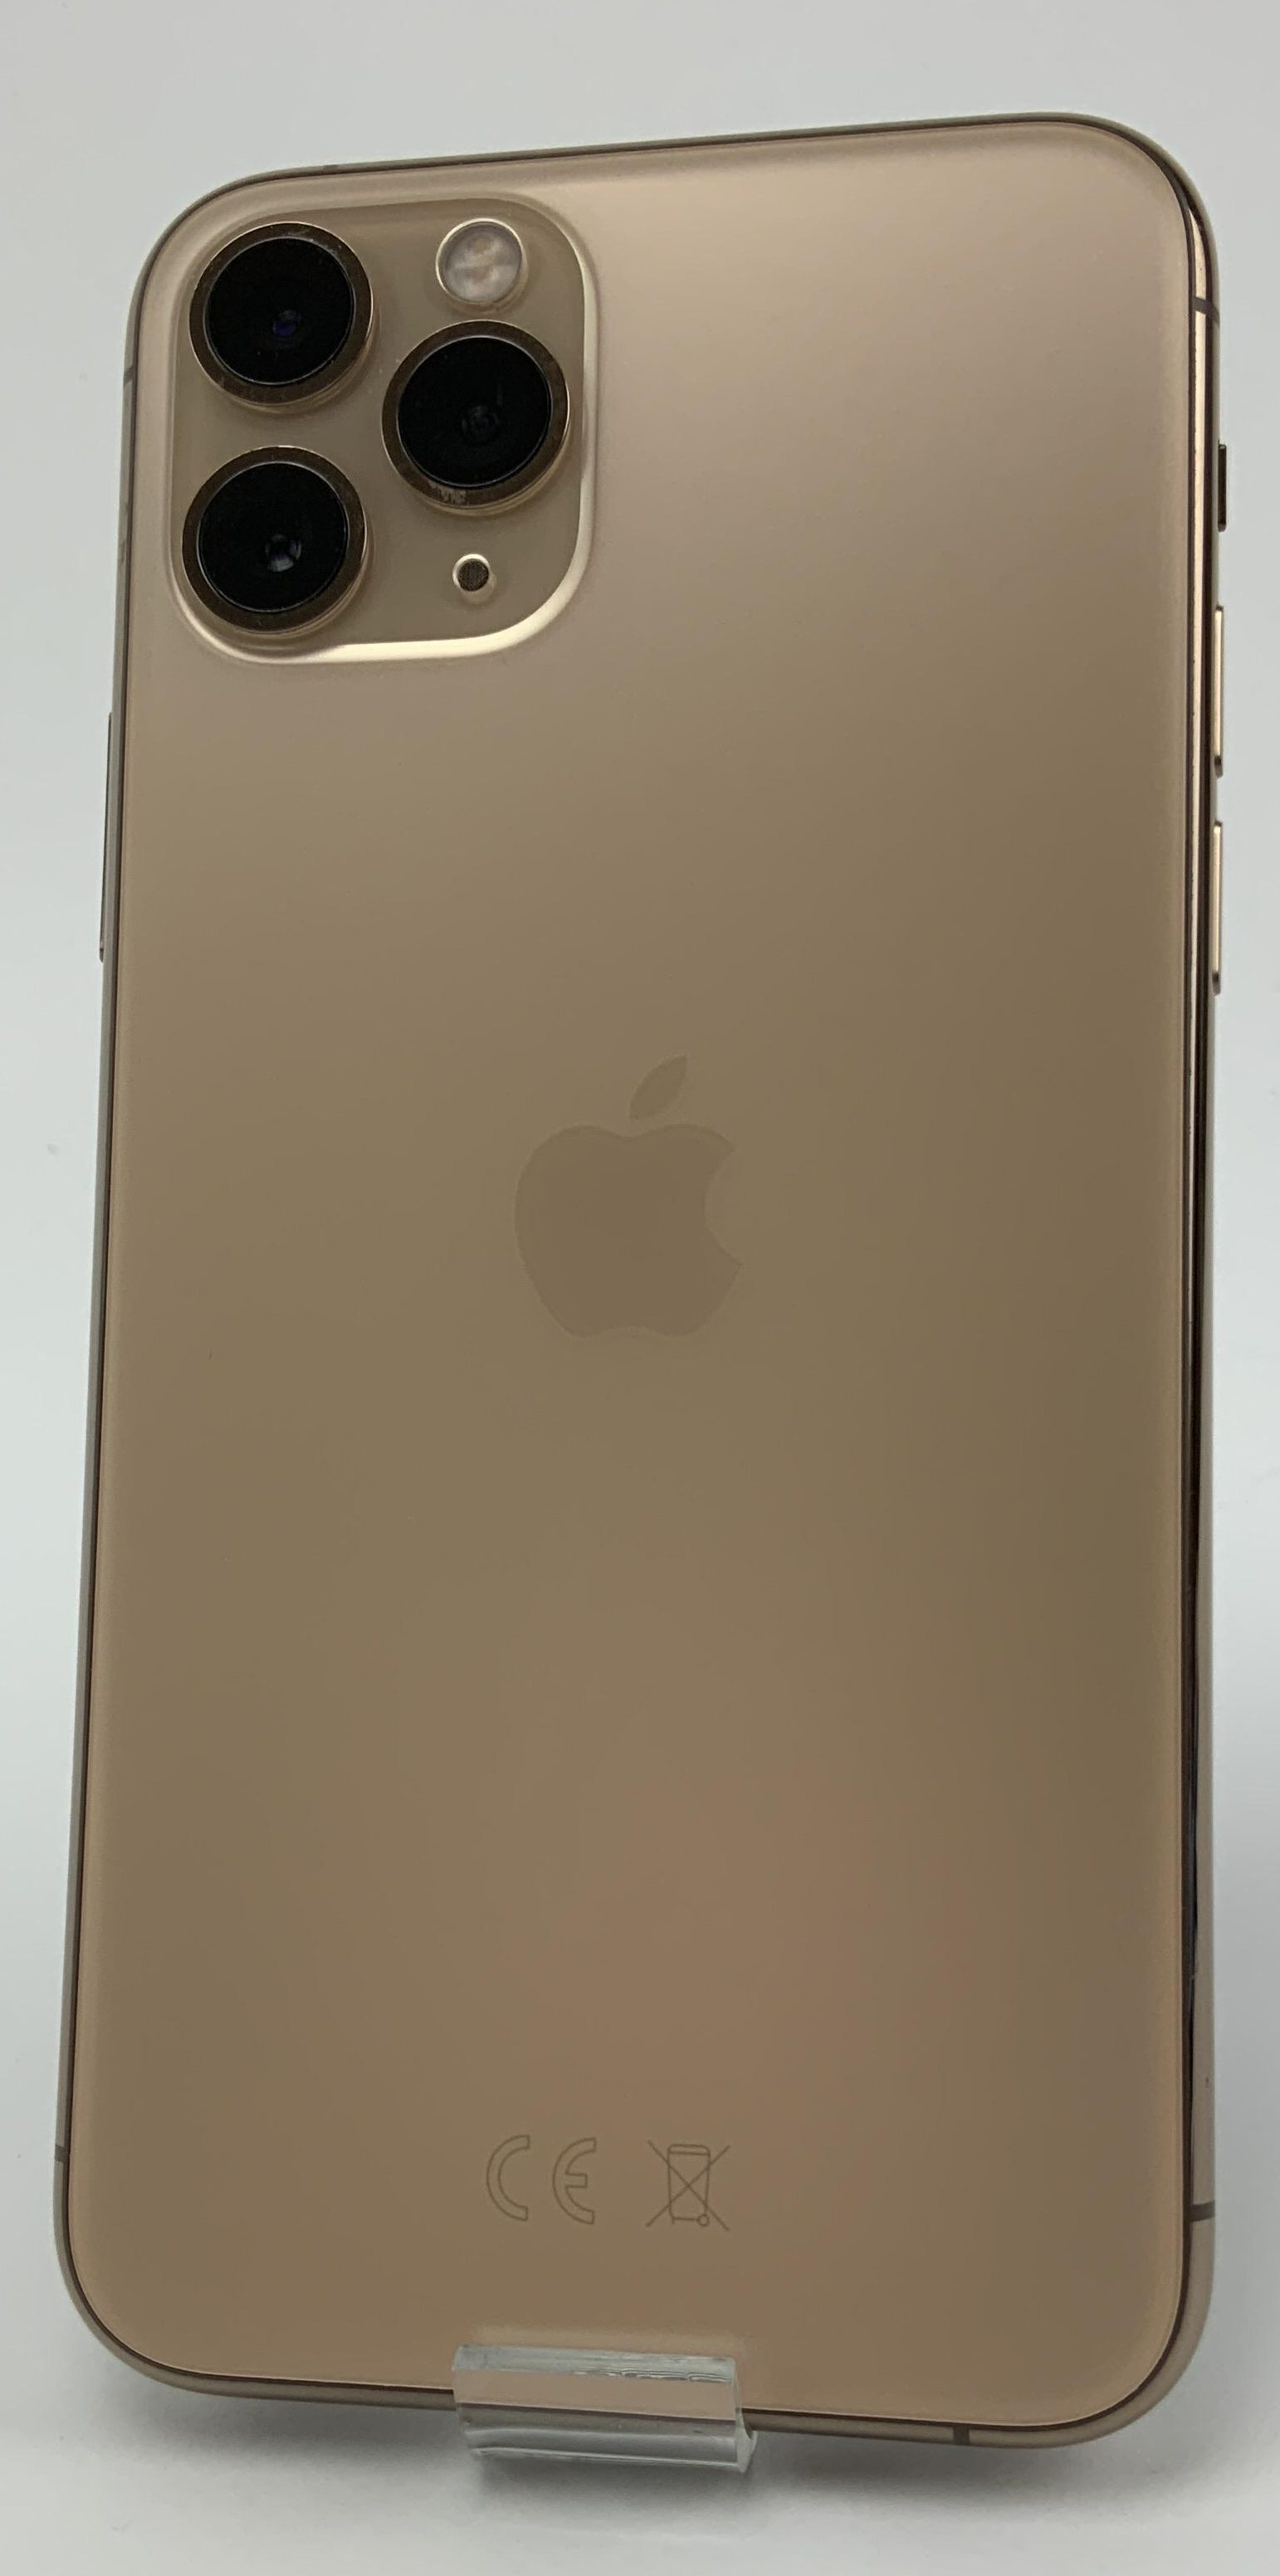 iPhone 11 Pro 64GB, 64GB, Gold, immagine 2